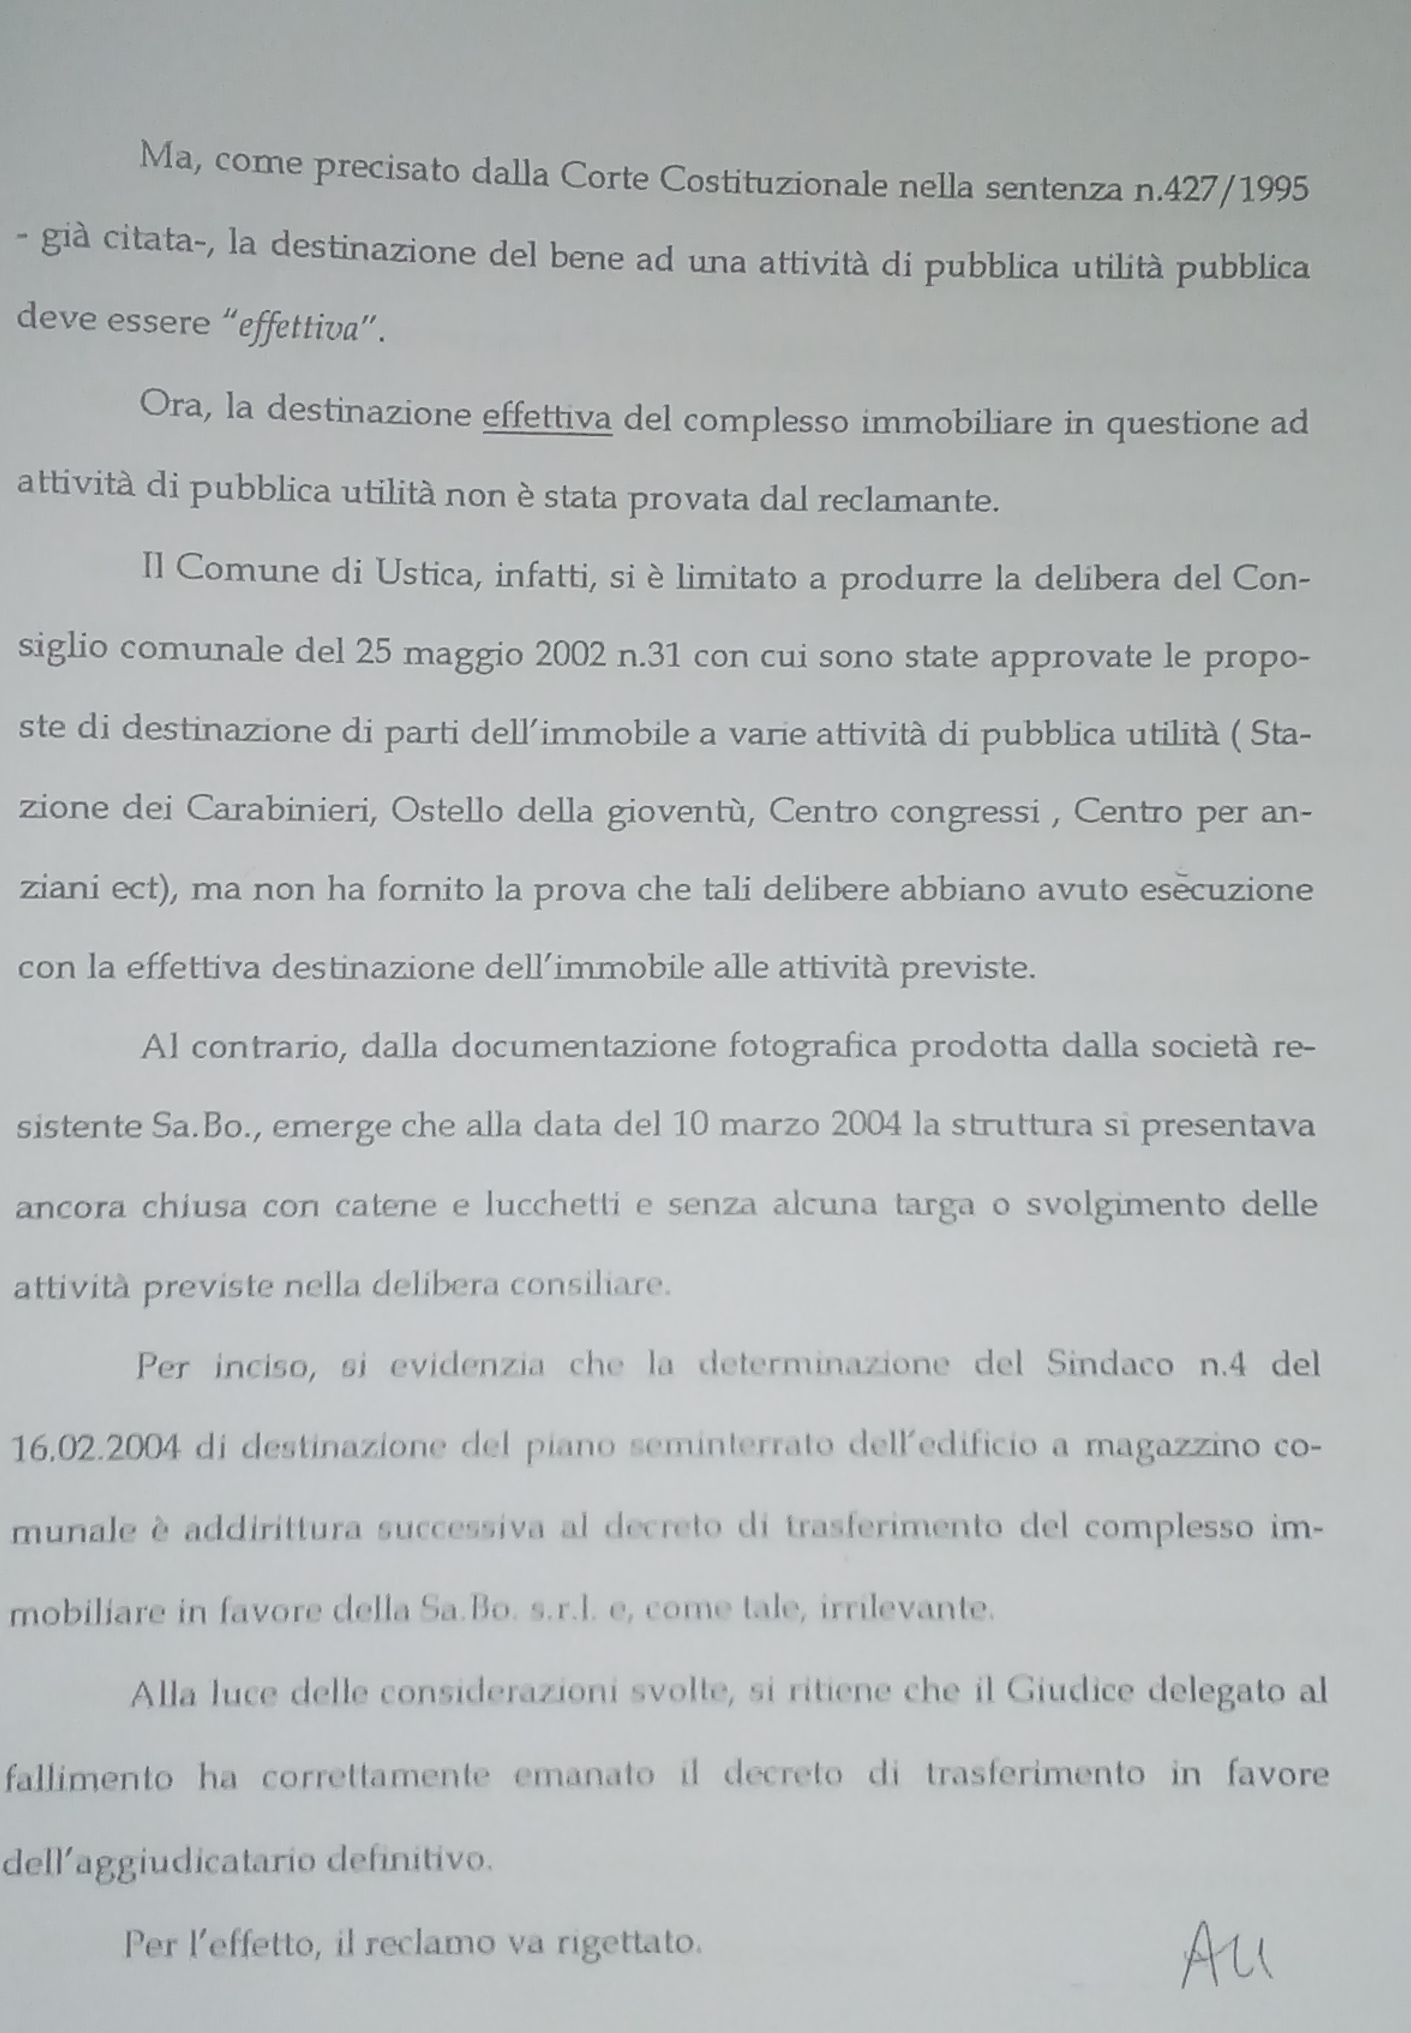 jpeg-Decreto-2004-pag-2-ritagliata